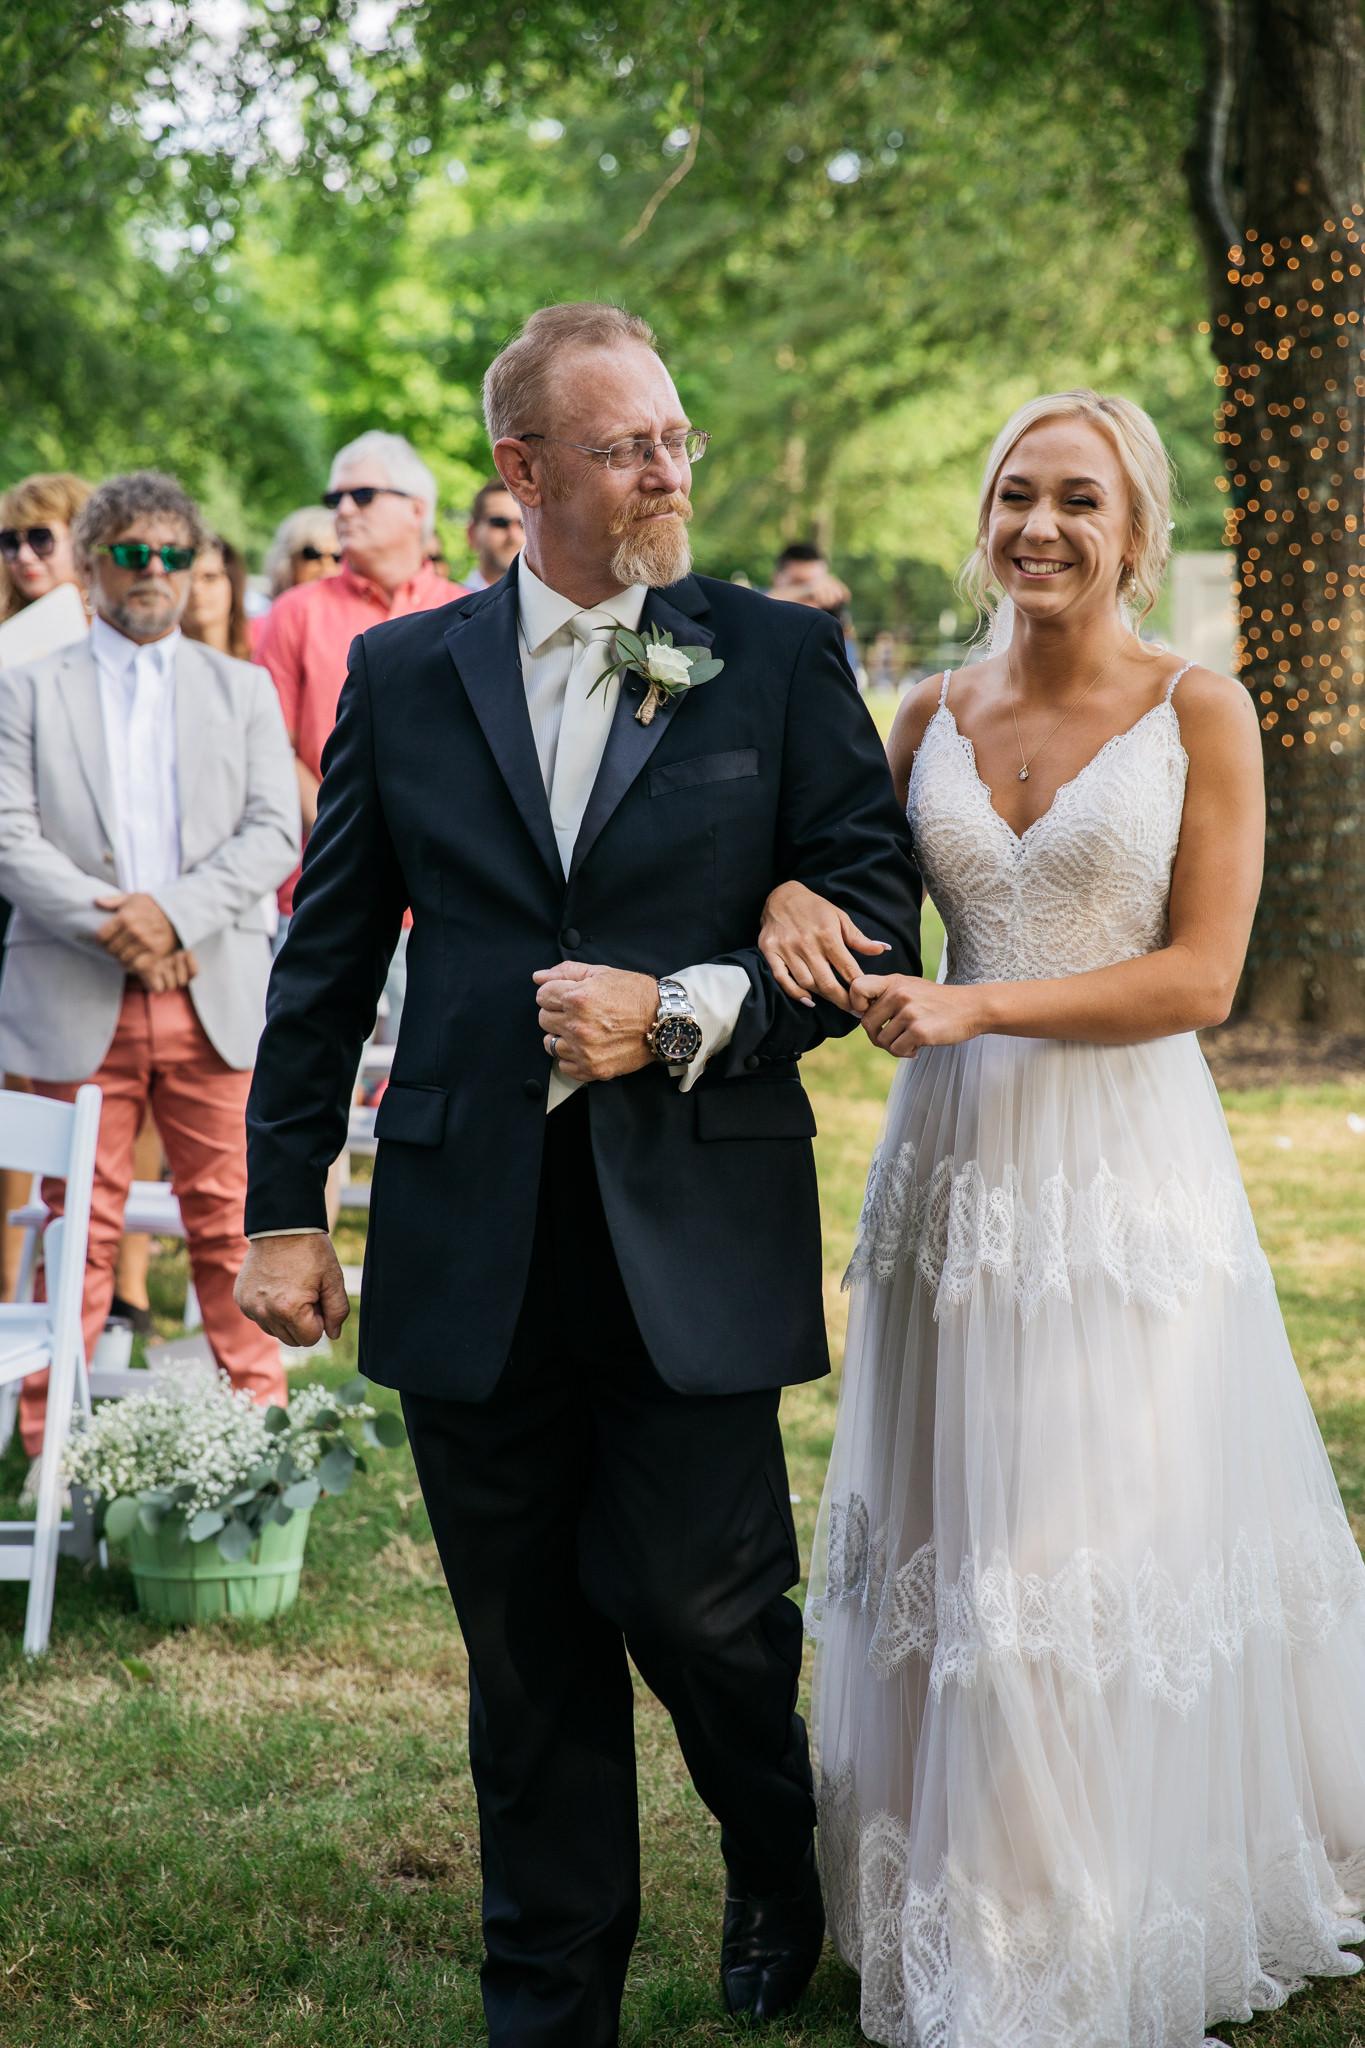 zbackyard-wedding-thewarmtharoundyou-lexy-branson-403.jpg